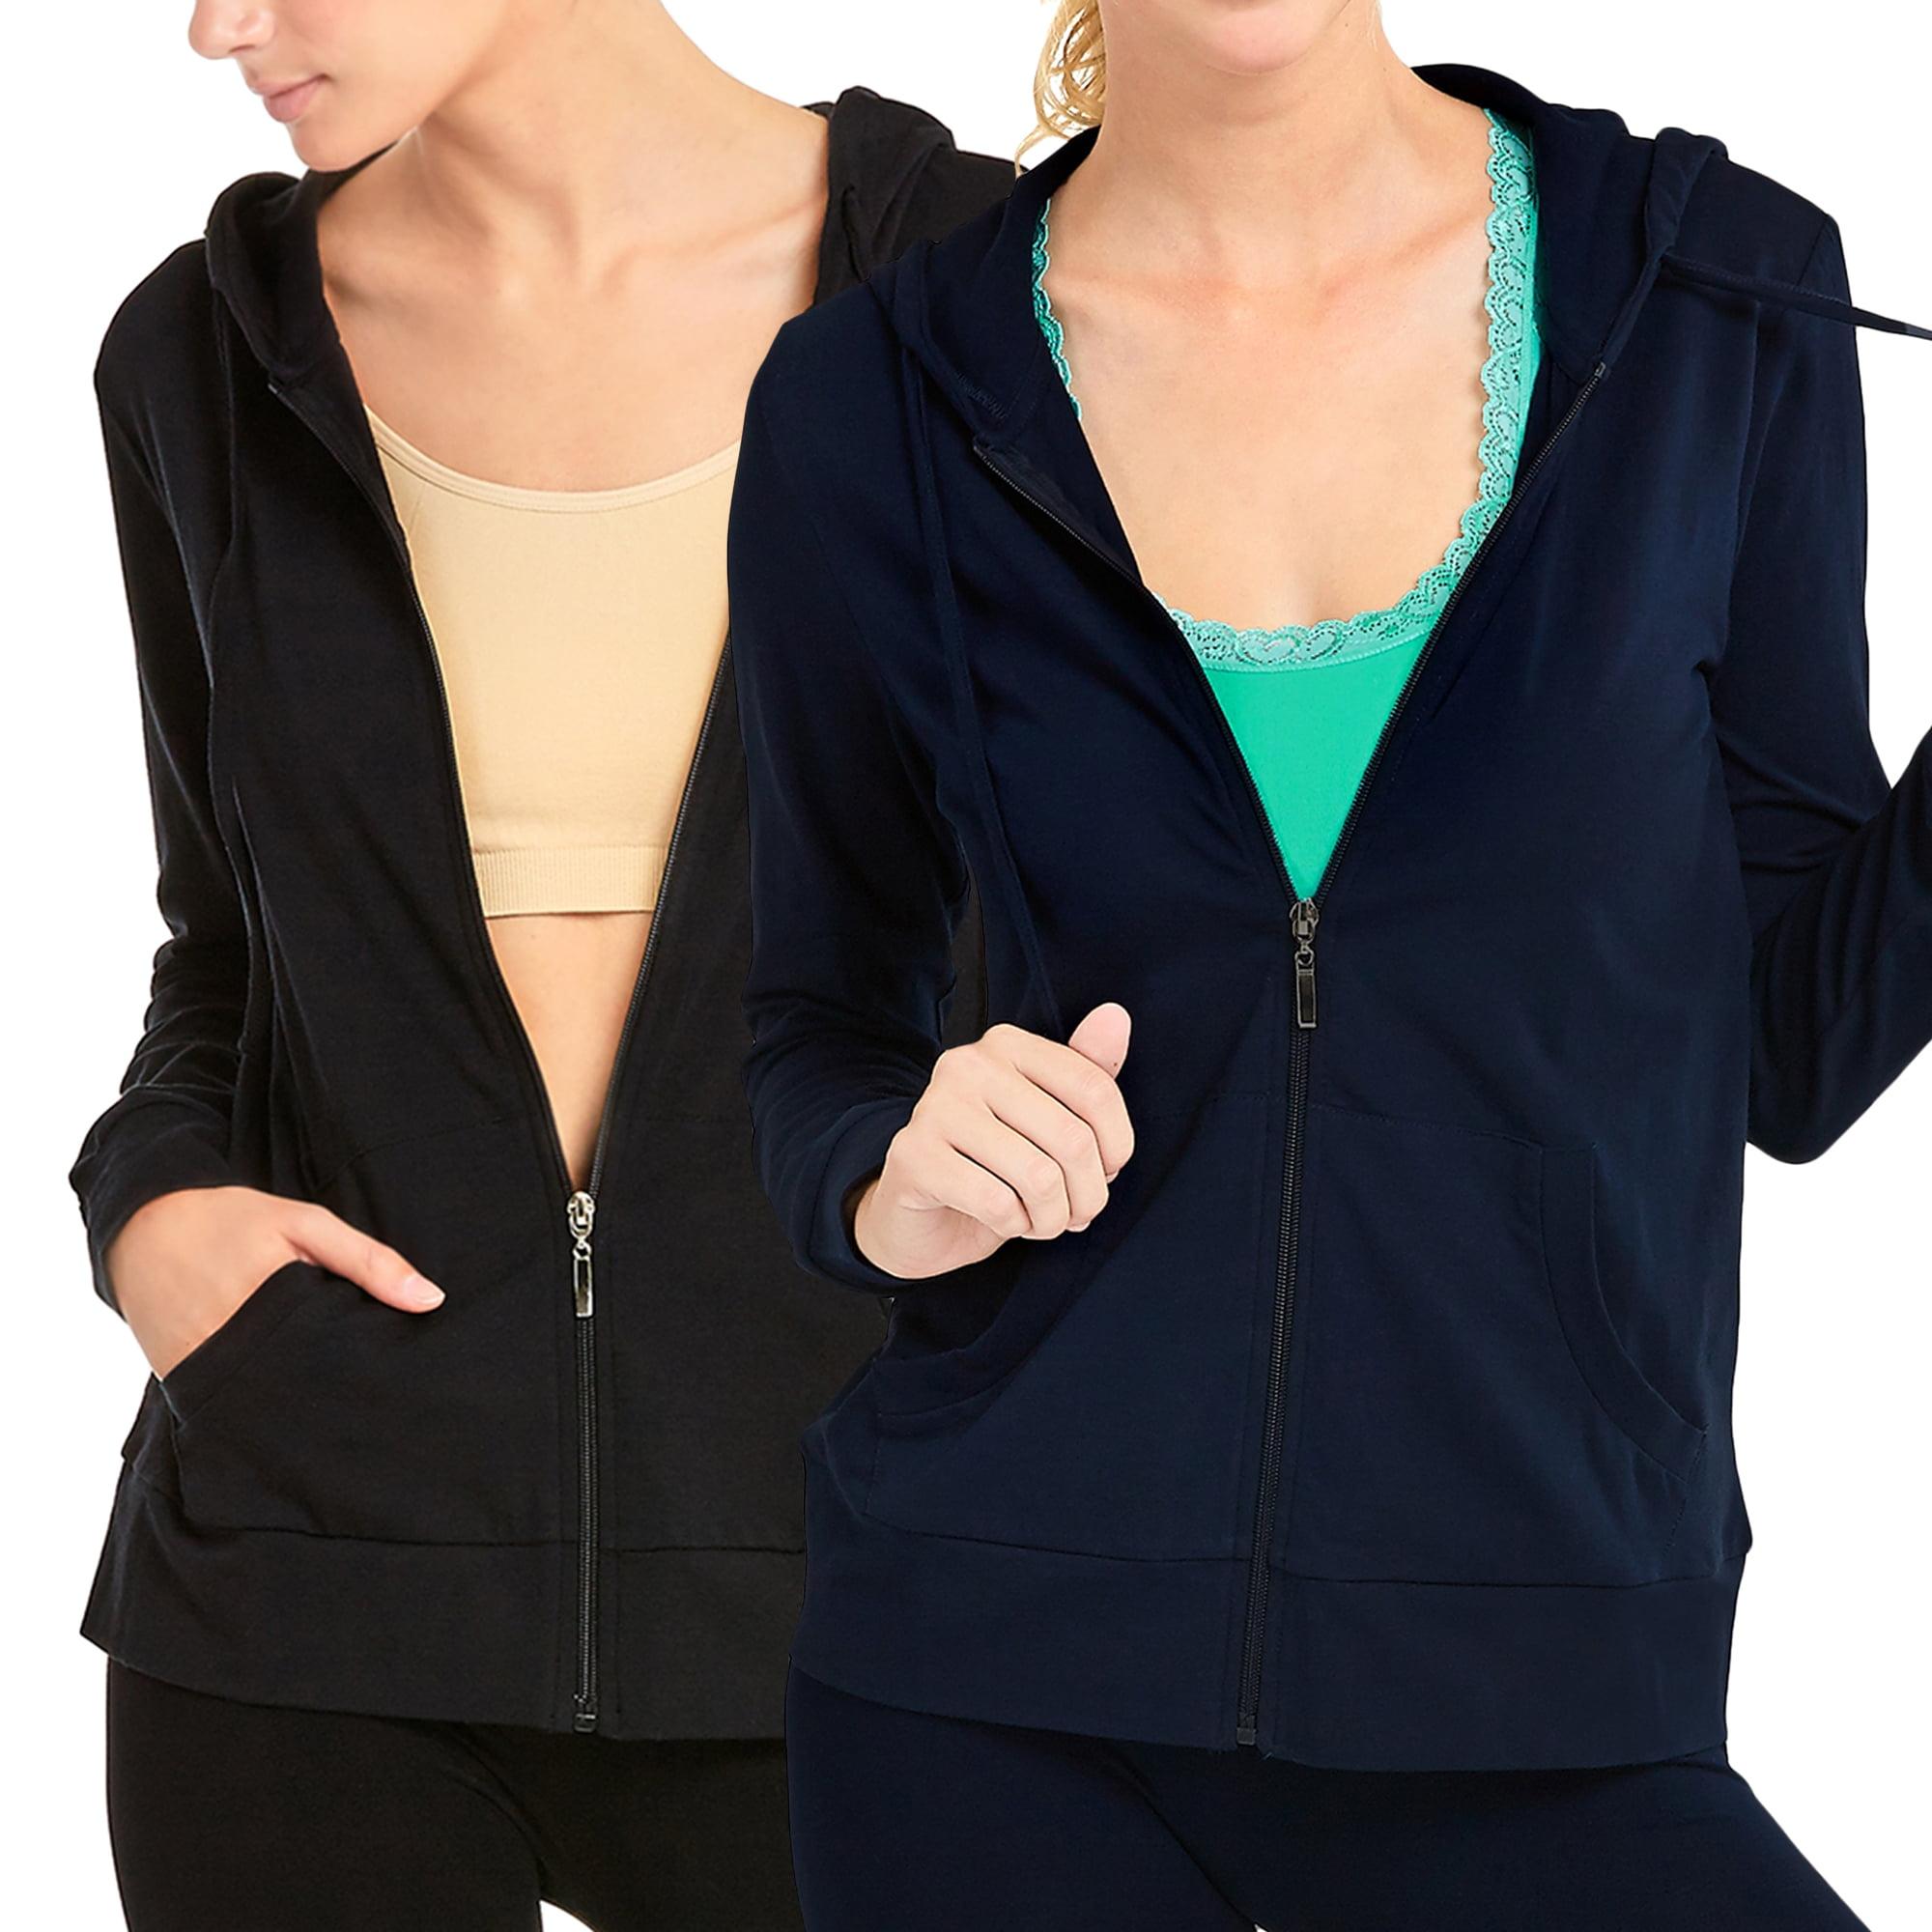 Ladies Womens Navy Soft Velvet Sweatshirt Warm Comfy Longsleeve Jumper.Size:8-18